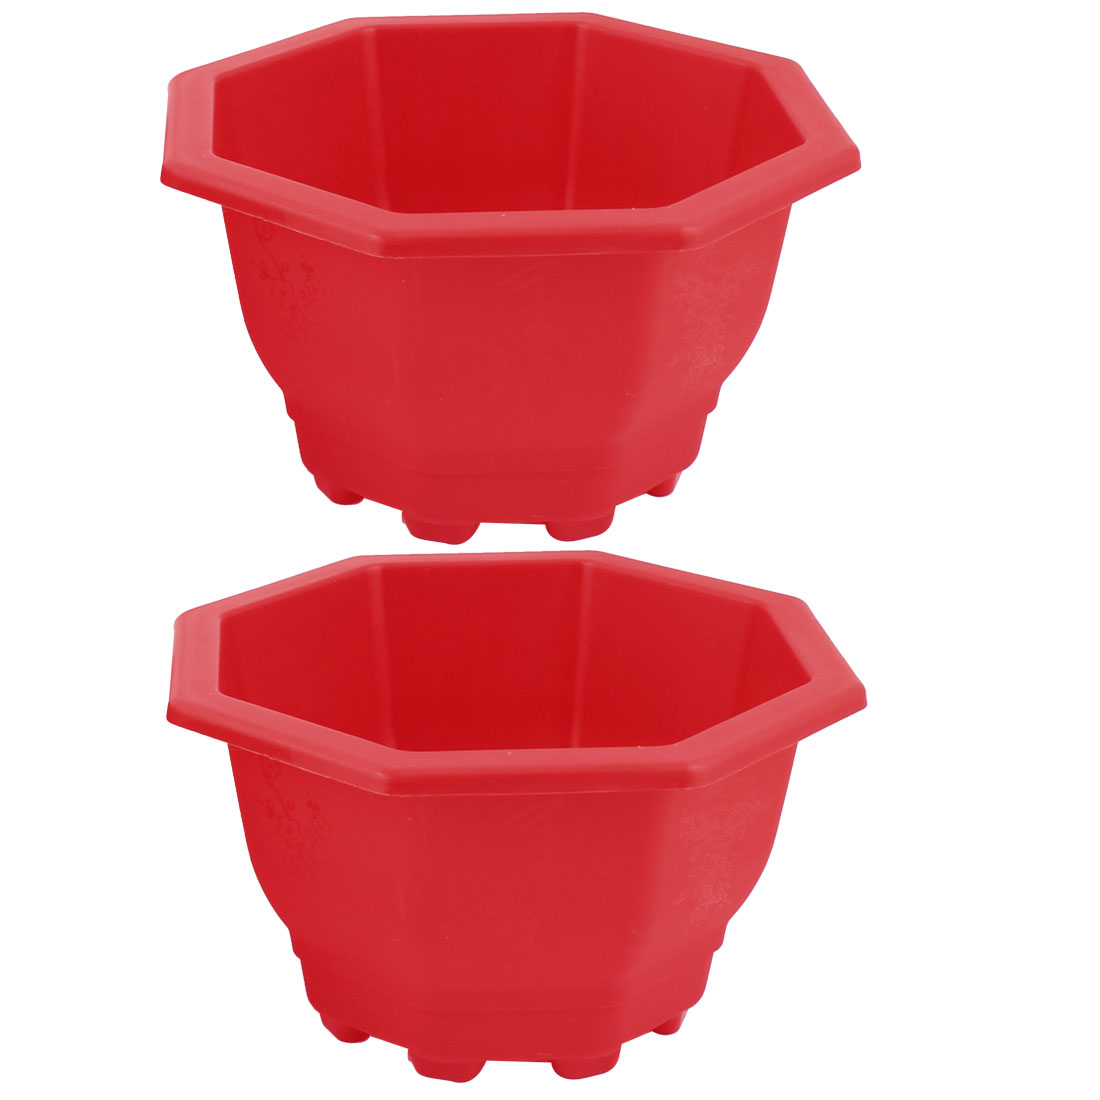 2pcs Blue Red Plastic Octagon Shape Garden Planter Plant Flower Pot Flowerpot